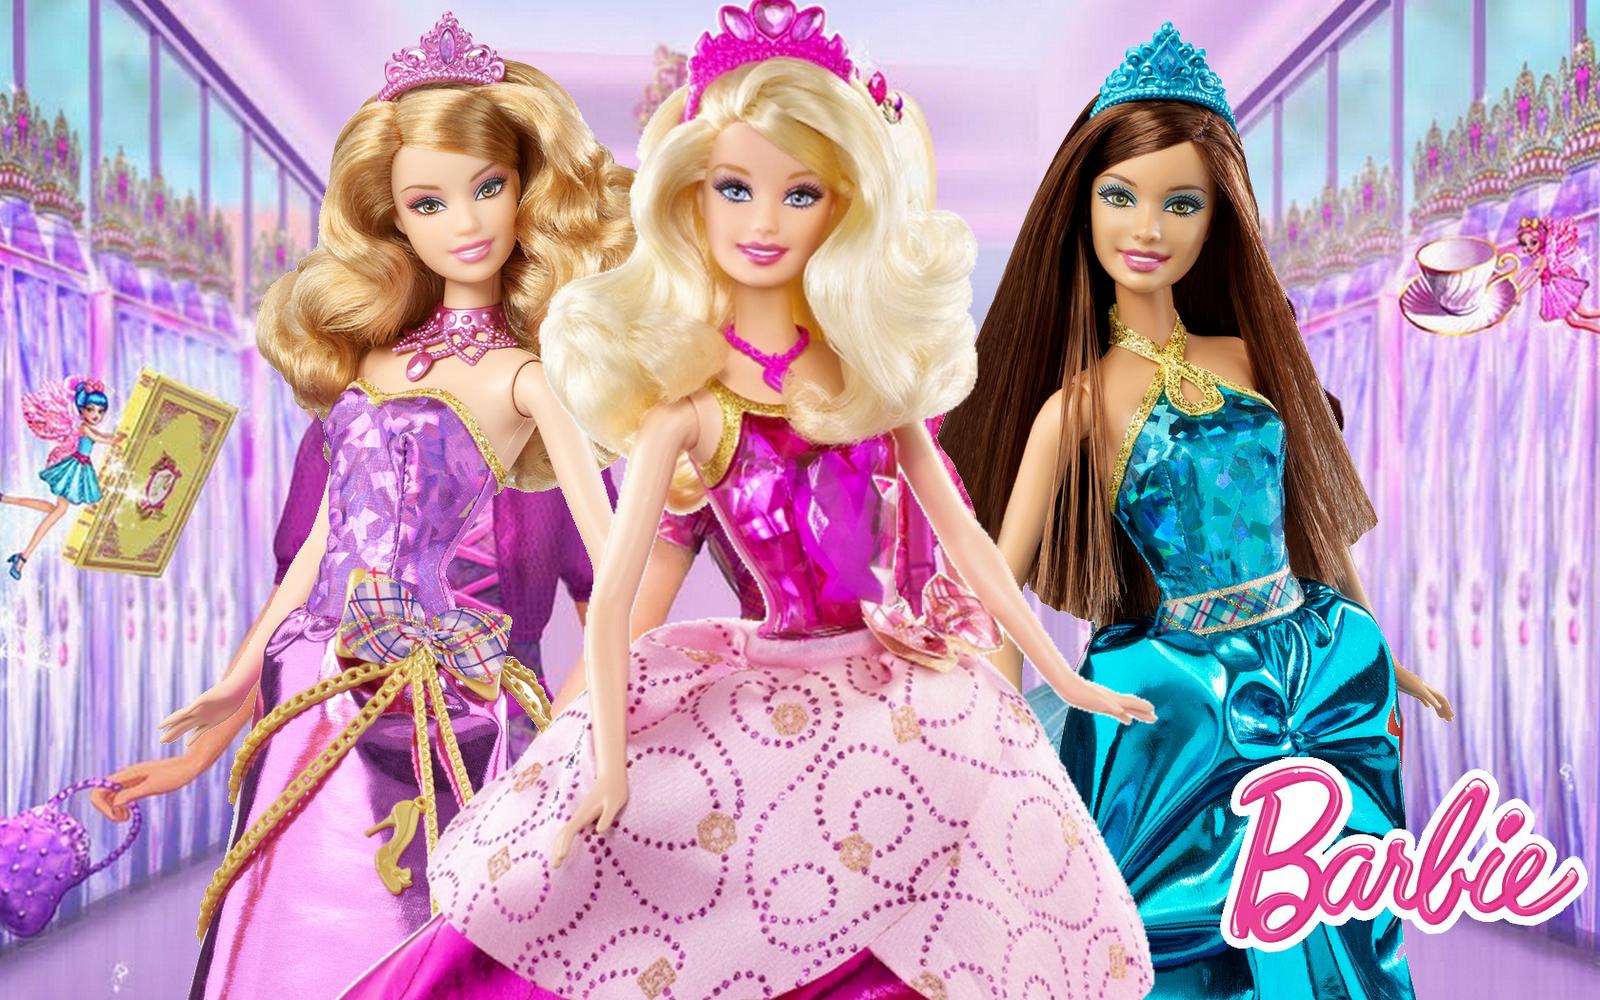 Barbie Cartoon Barbie Cartoon Wallpaper Hd Background 2013